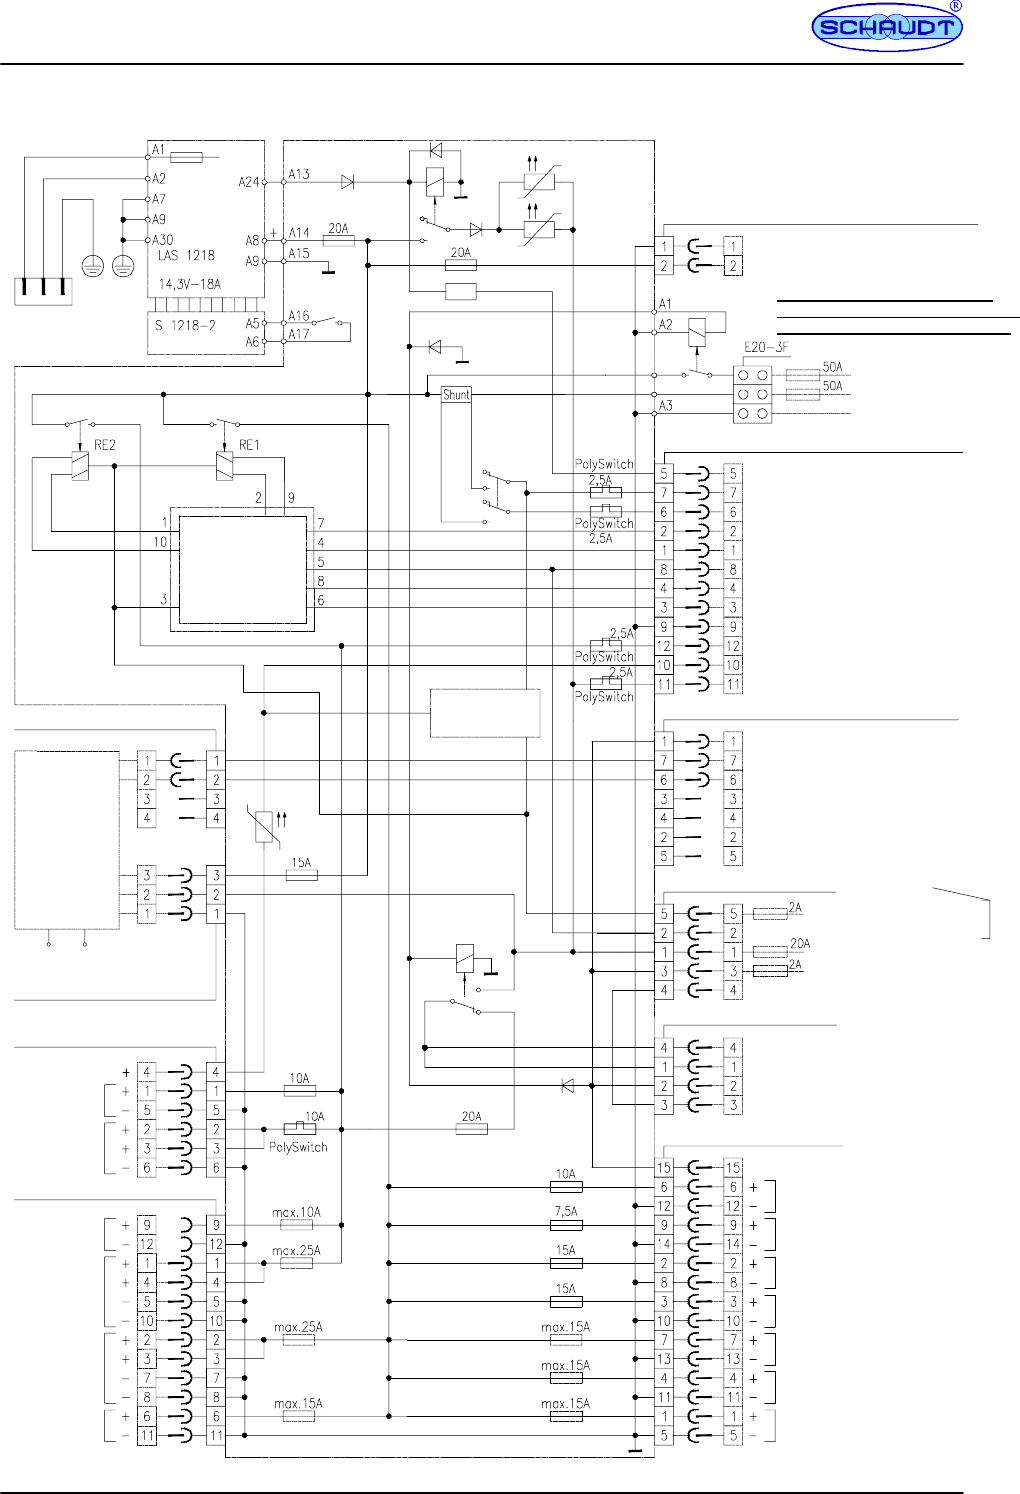 handleiding schaudt elektroblock ebl 101 c  pagina 16 van 16   english